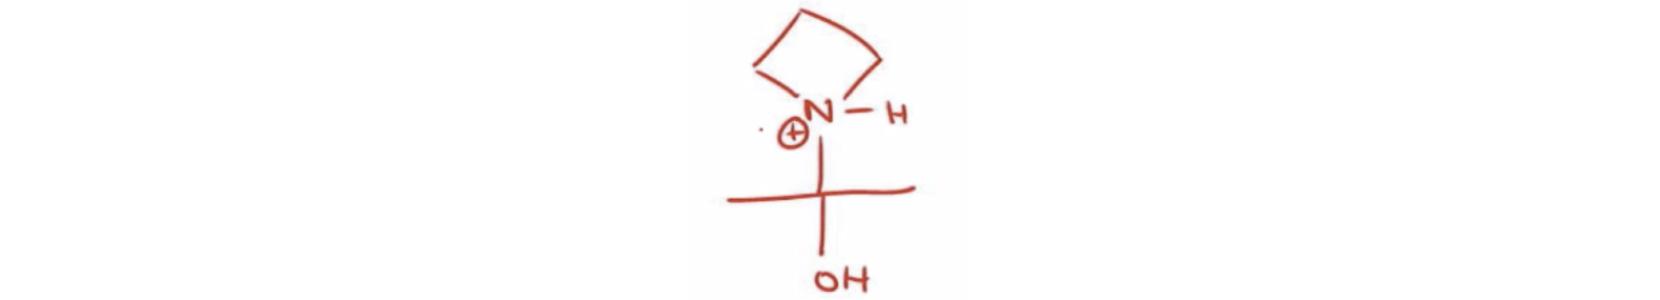 Enamine-Tetrahedral-Intermediate